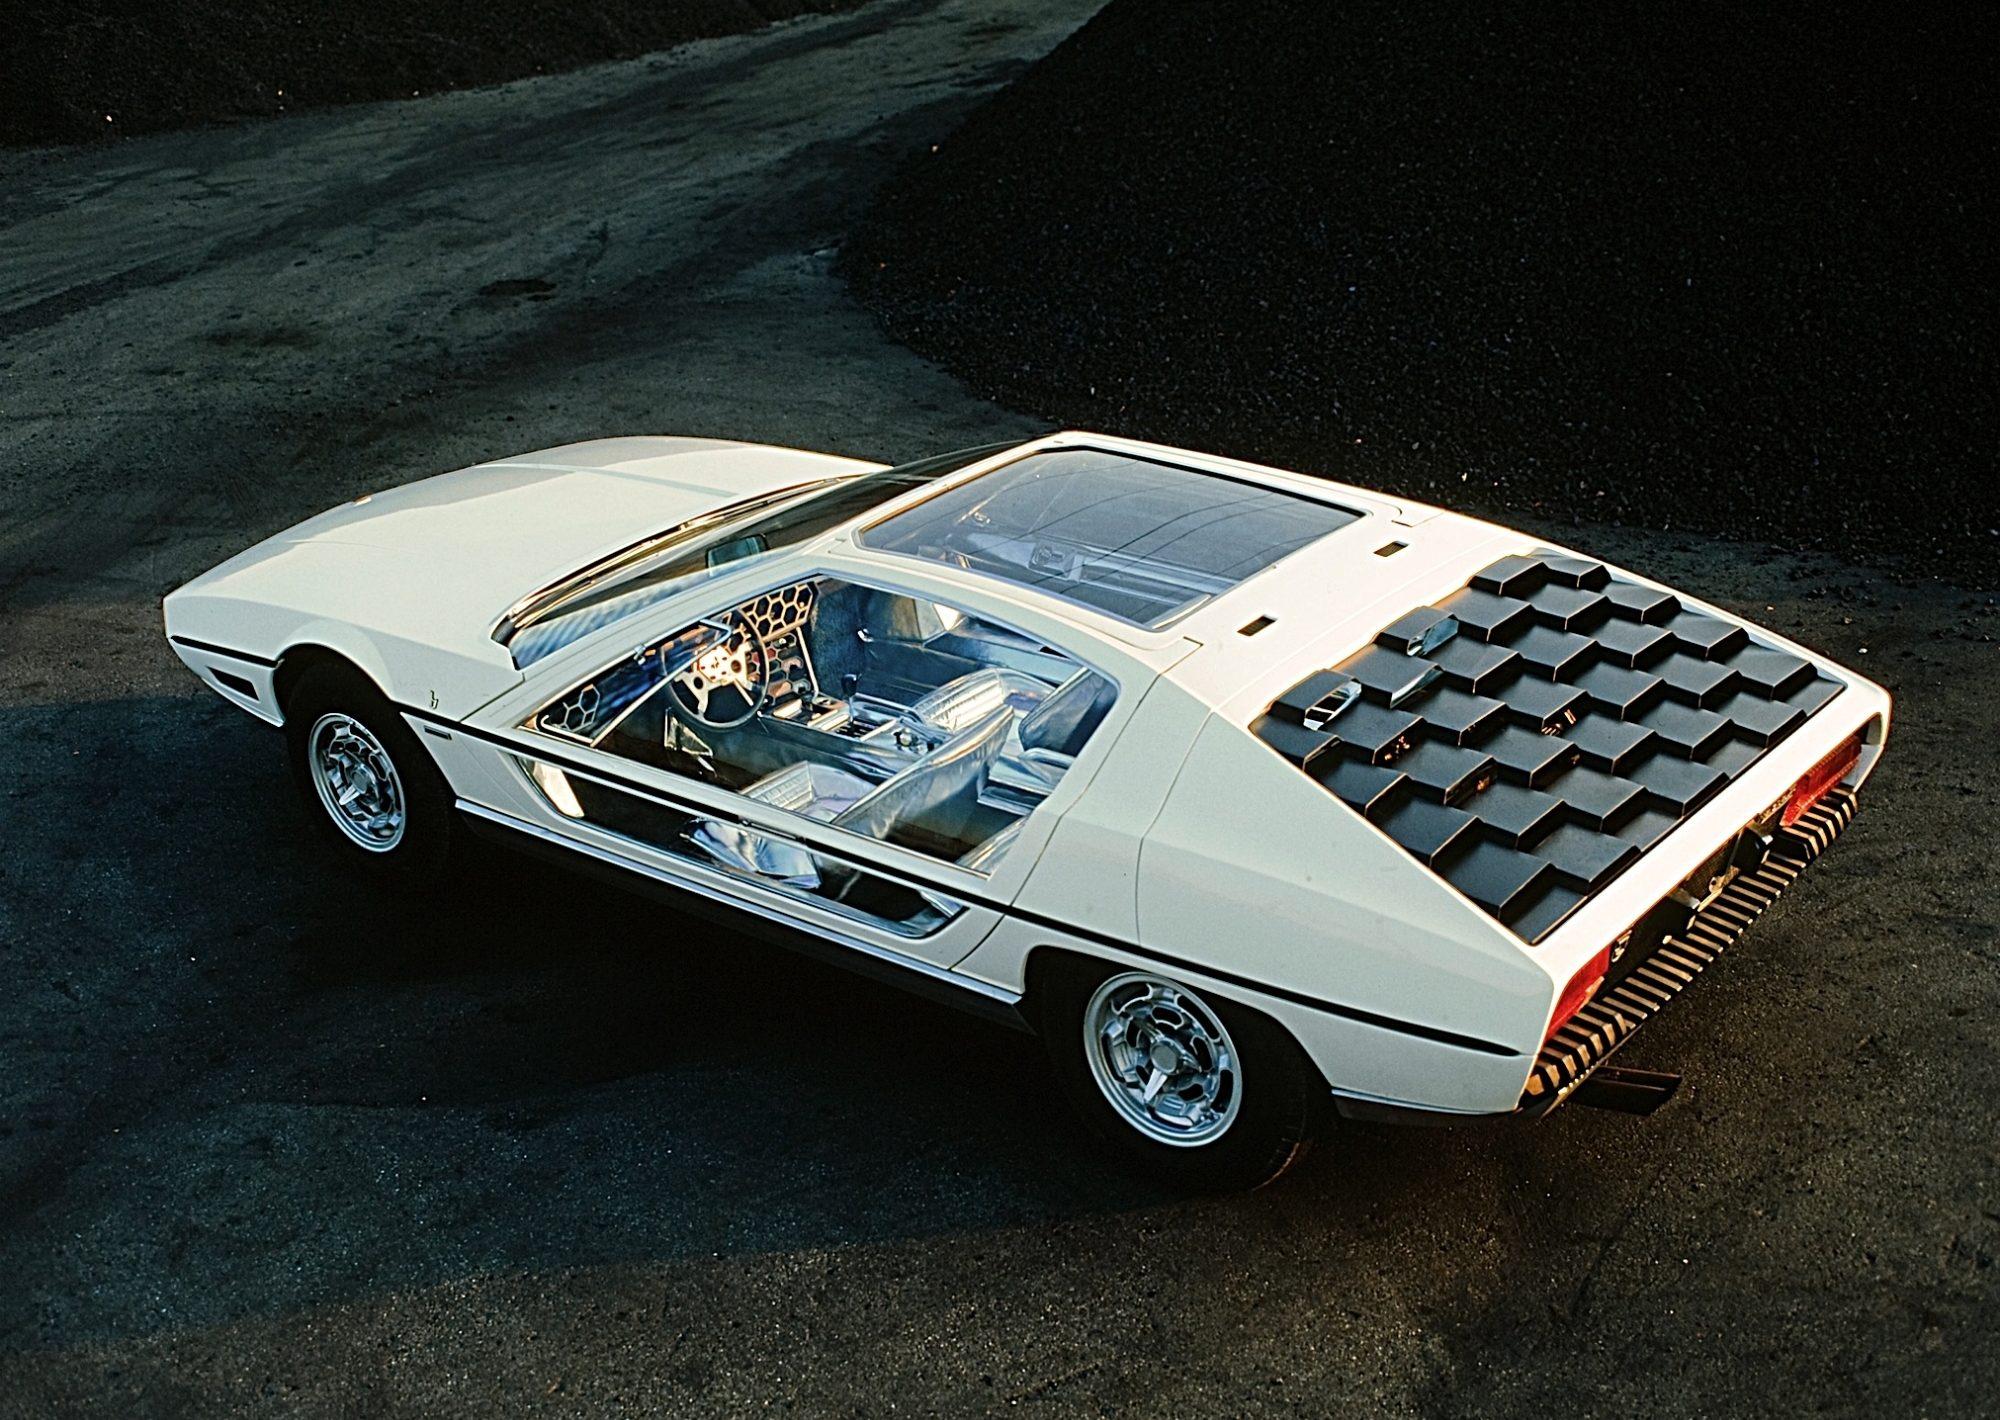 Concept Cars - Lamborghini Marzal